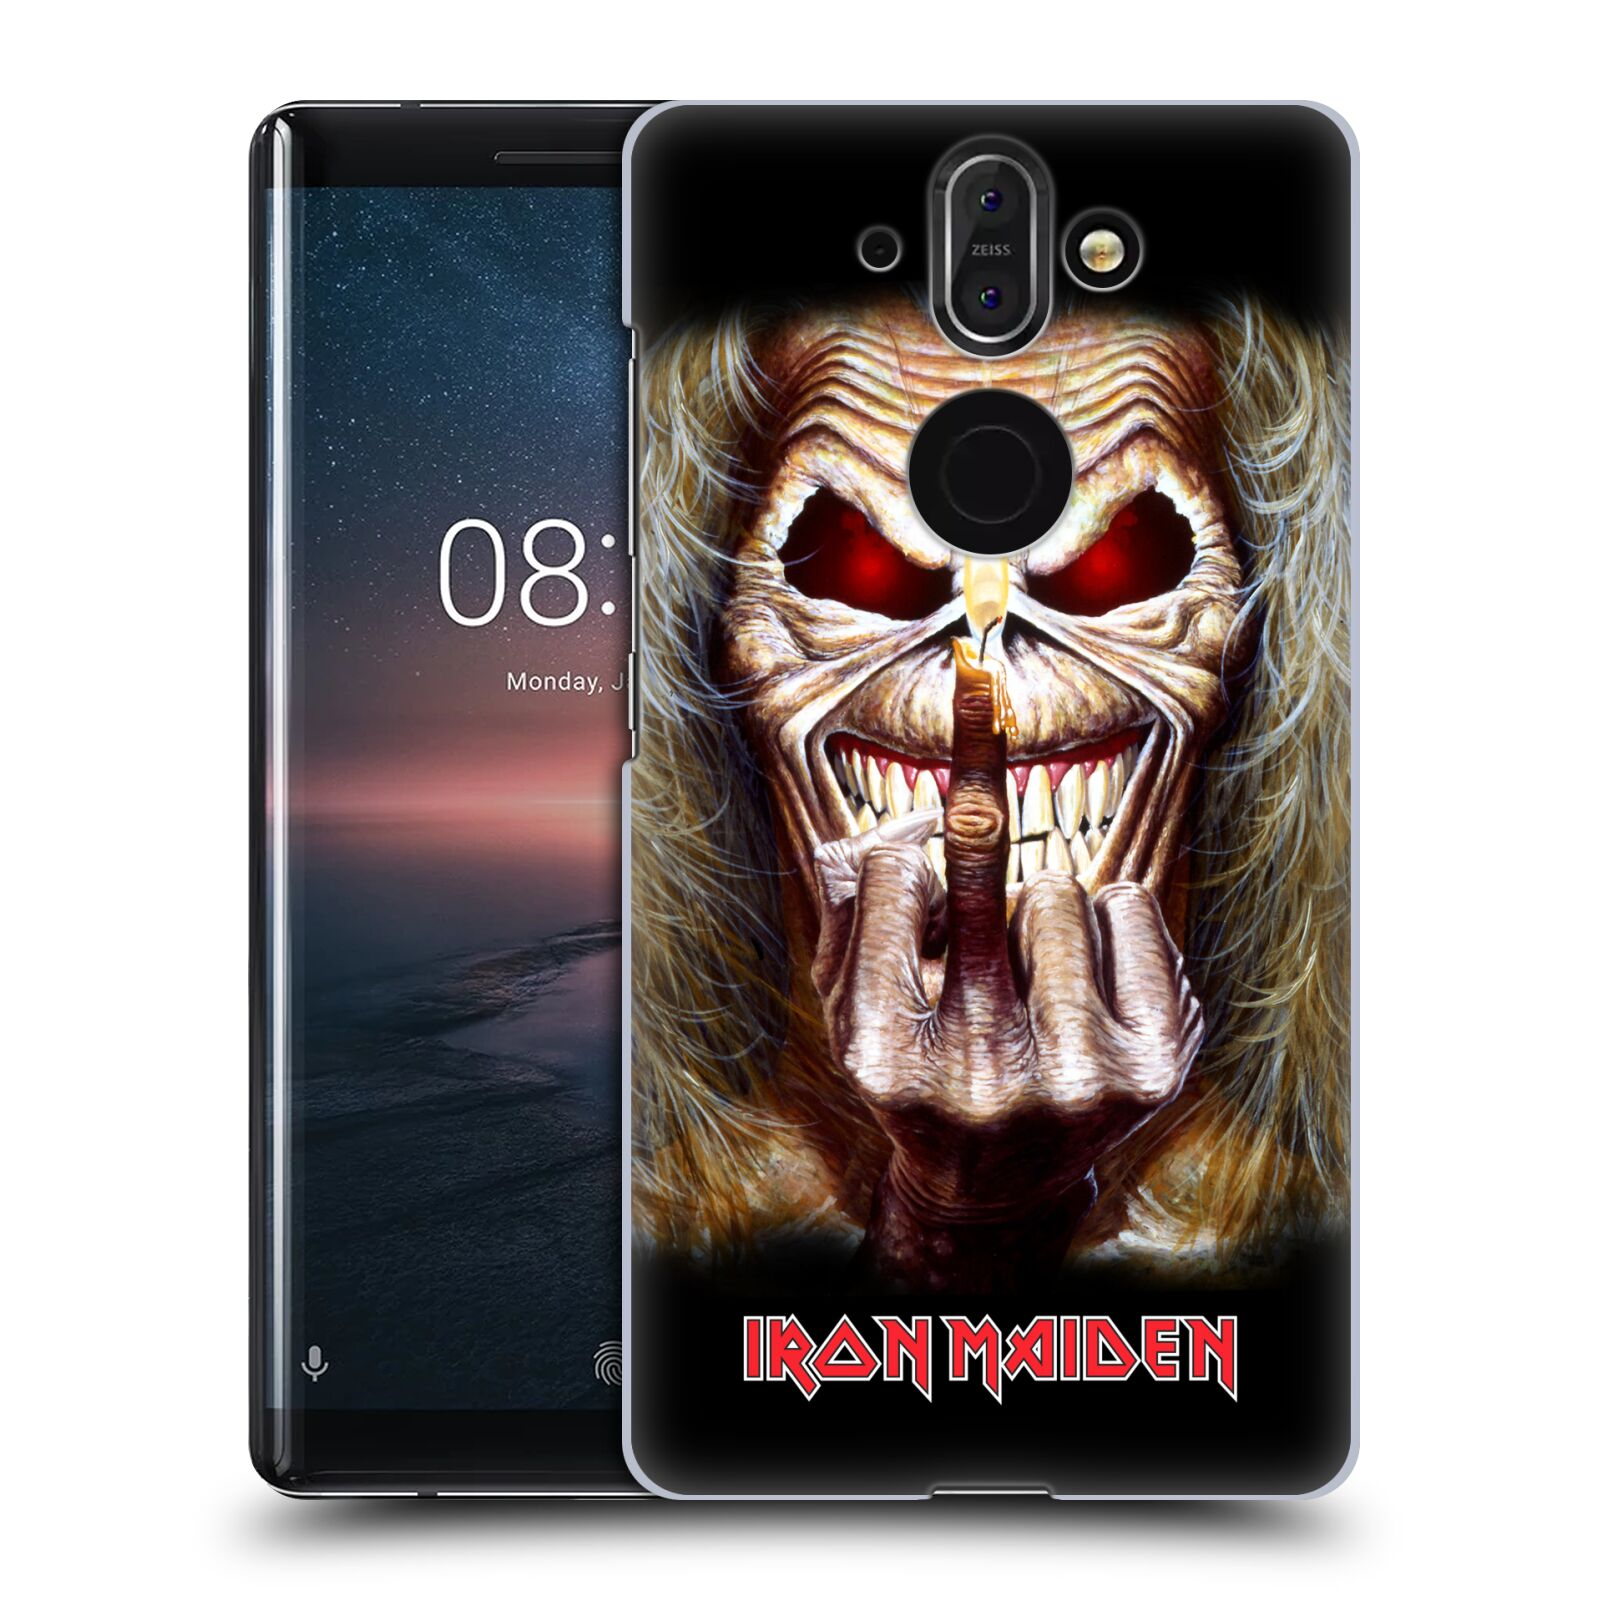 Plastové pouzdro na mobil Nokia 8 Sirocco - Head Case - Iron Maiden - Candle Finger